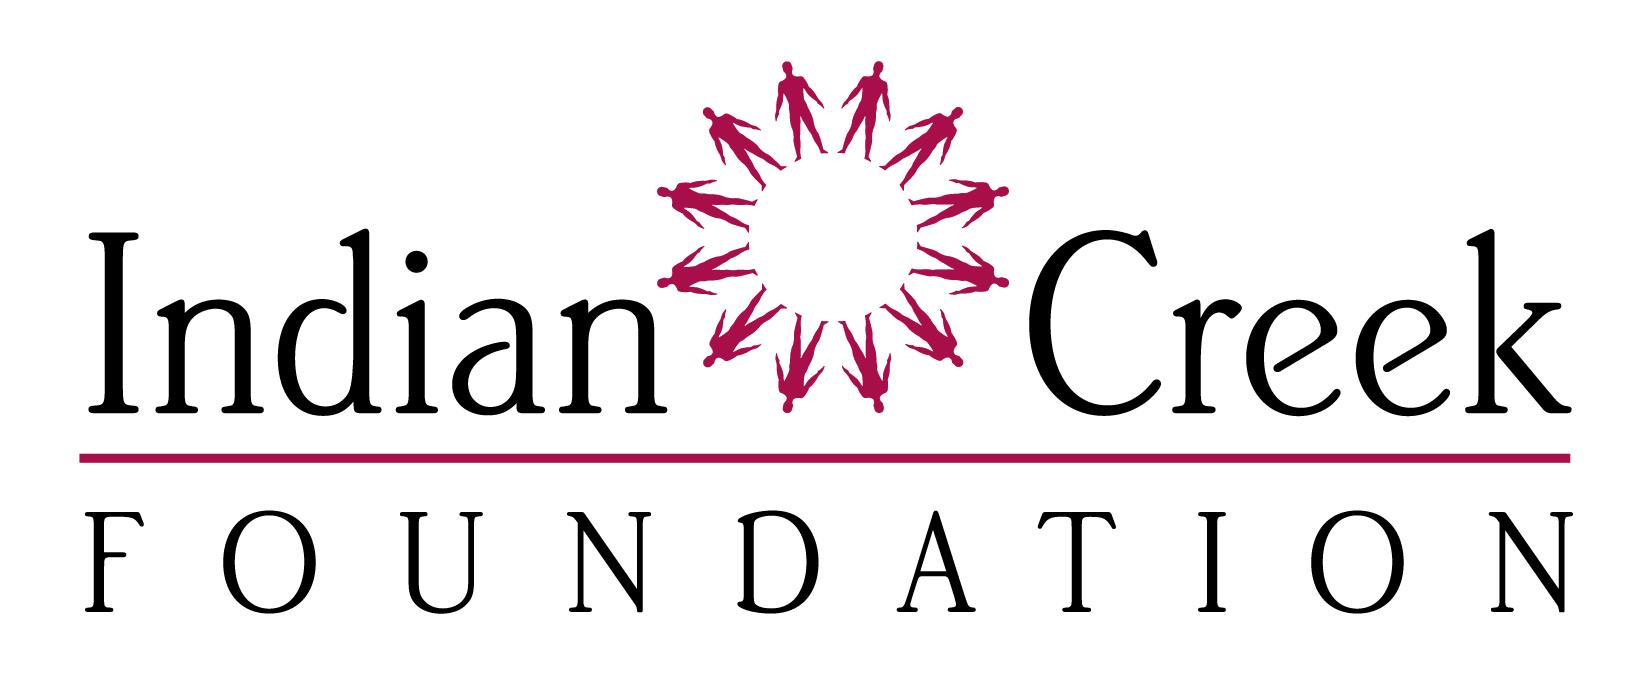 Indian Creek Foundation - GuideStar Profile